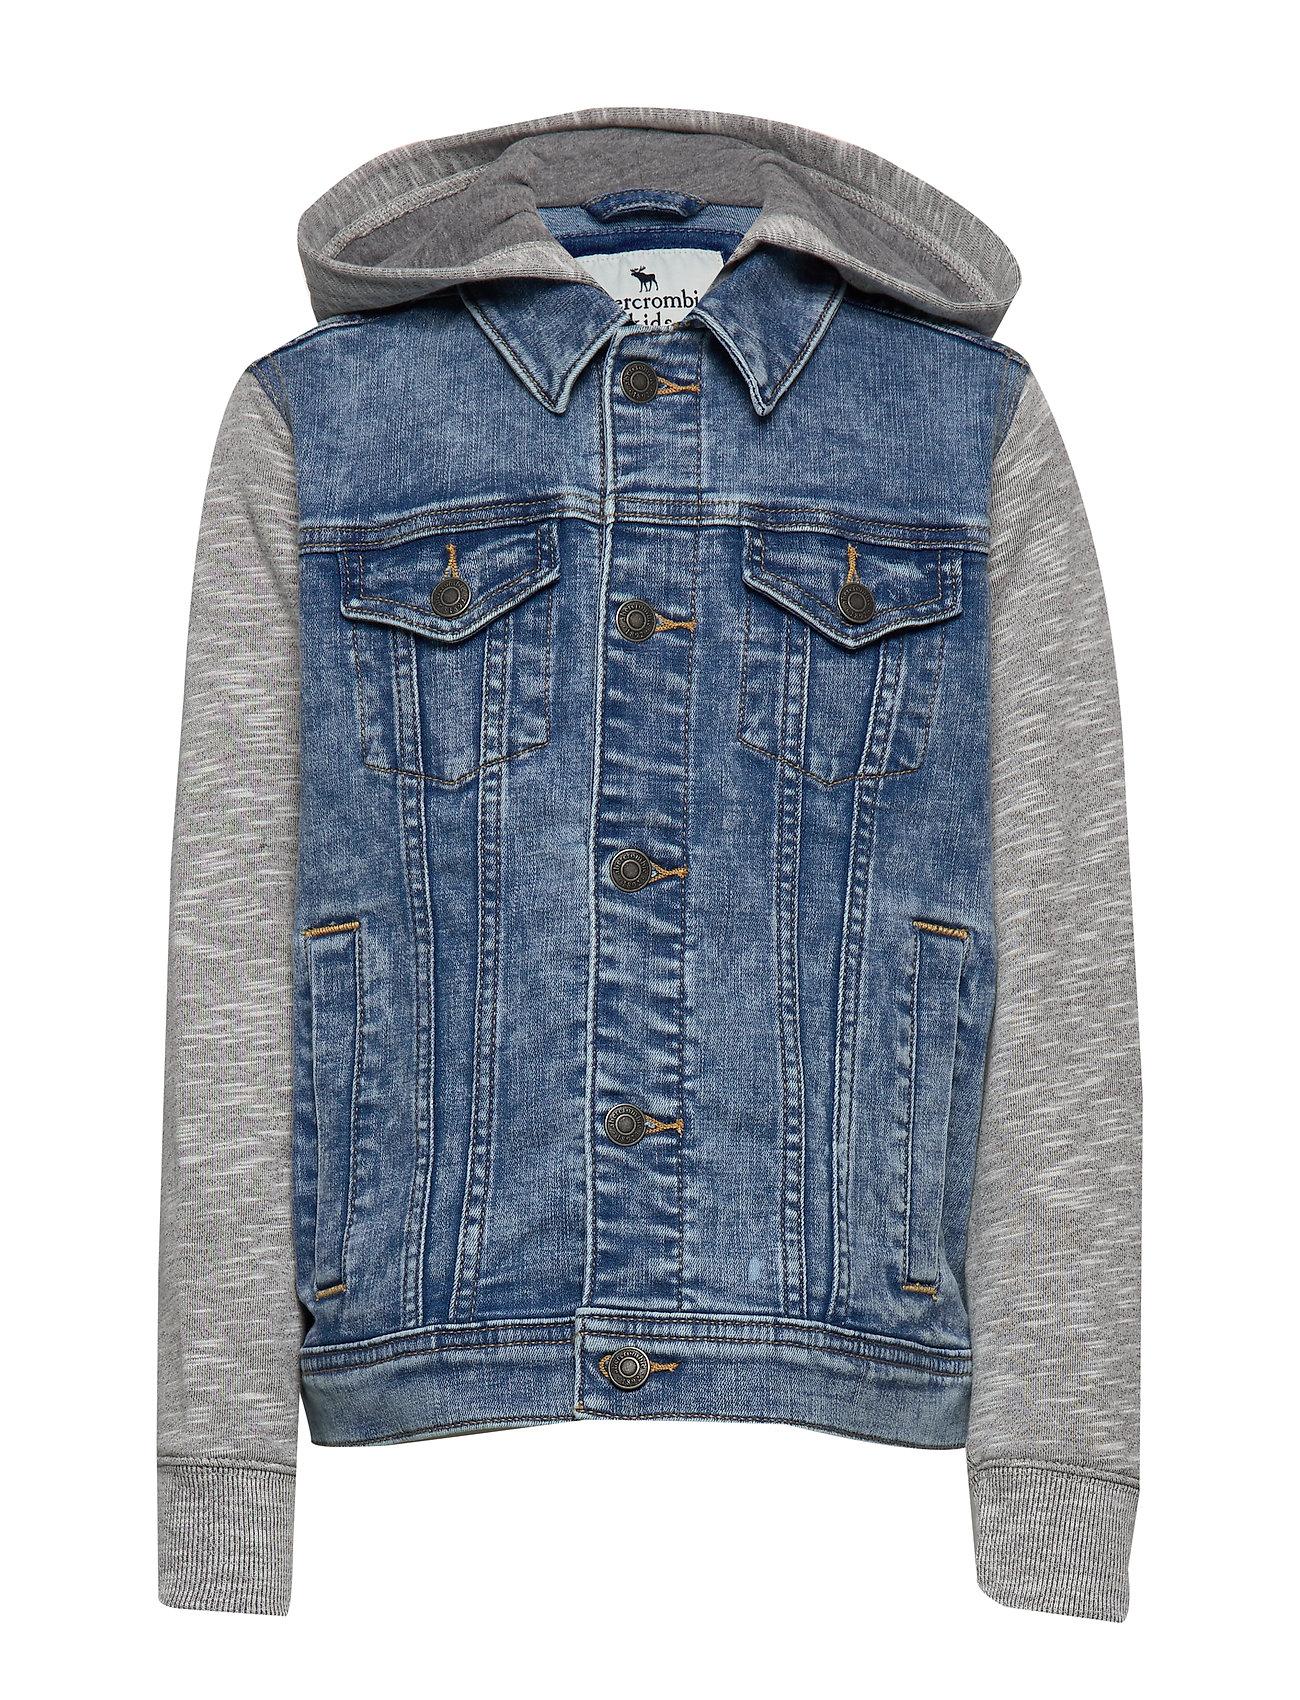 Image of Denim Outerwear Jackets & Coats Denim & Corduroy Blå Abercrombie & Fitch (3218820545)